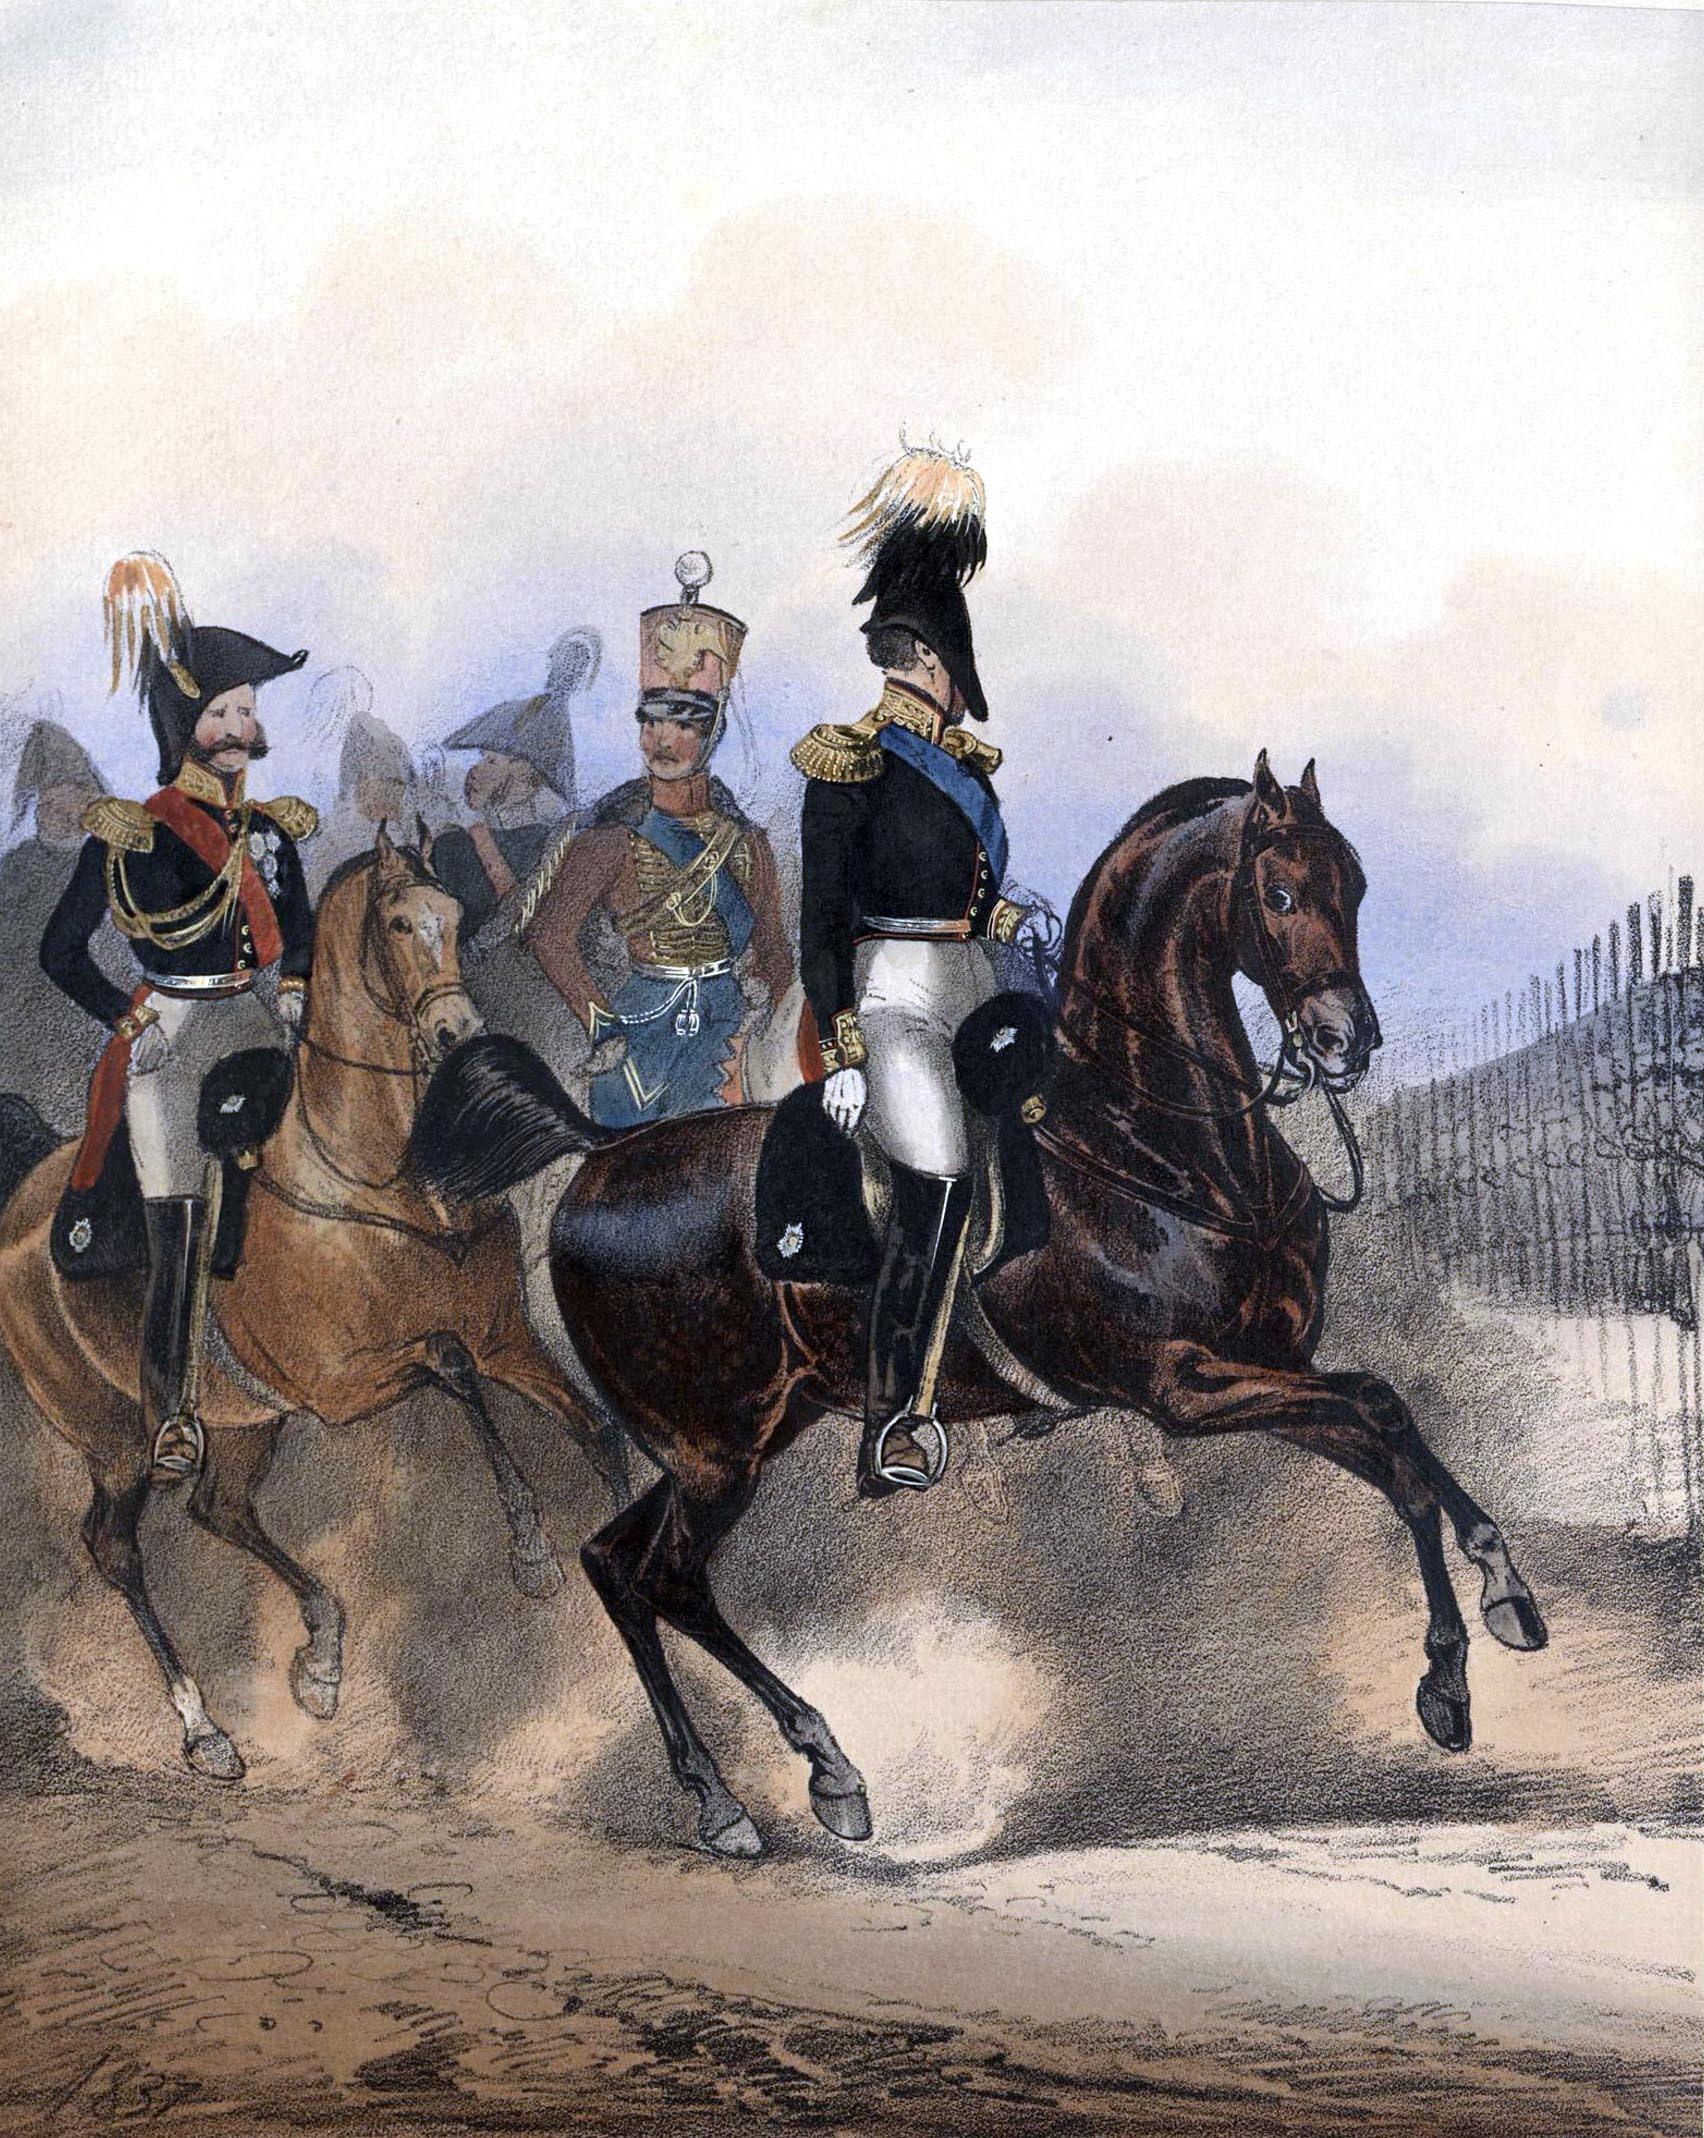 004. Kaiserthum Russland General der Cavallerie in Parade/ Российская империя Генерал кавалерии на параде